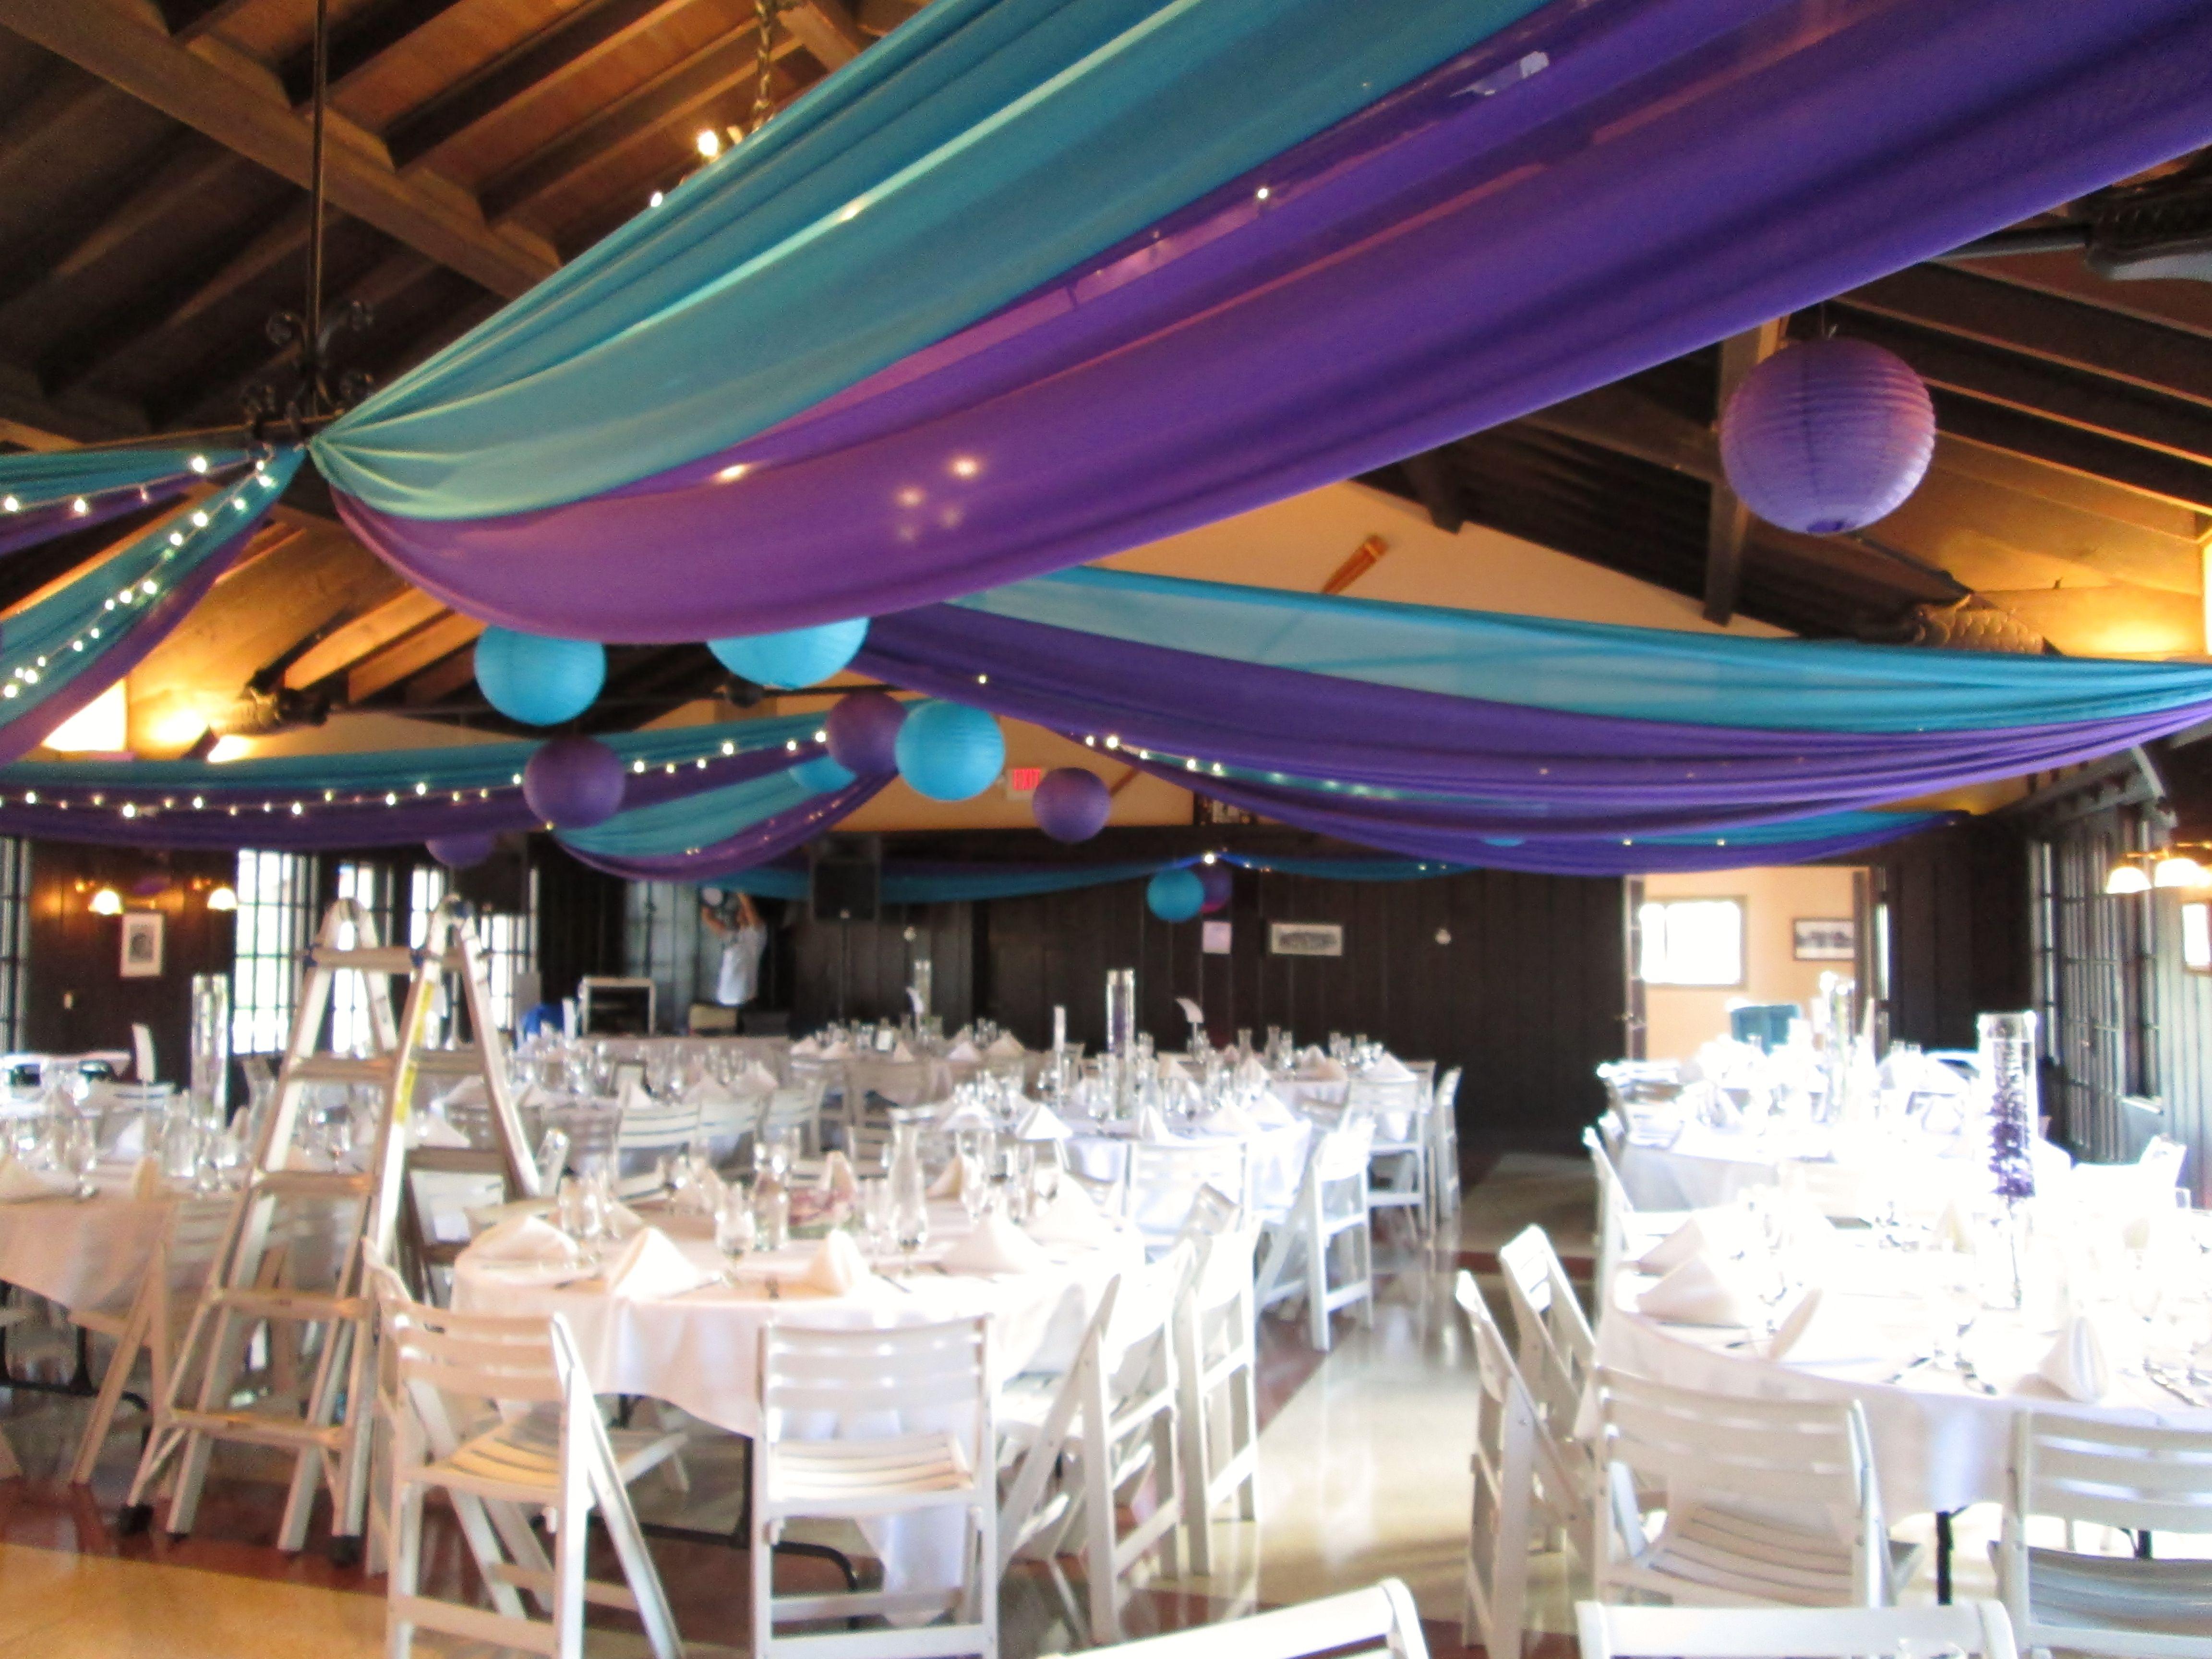 Turquoise & Purple Ceiling Draping, Turquoise & Purple Paper Lanterns  (unlit/floating)